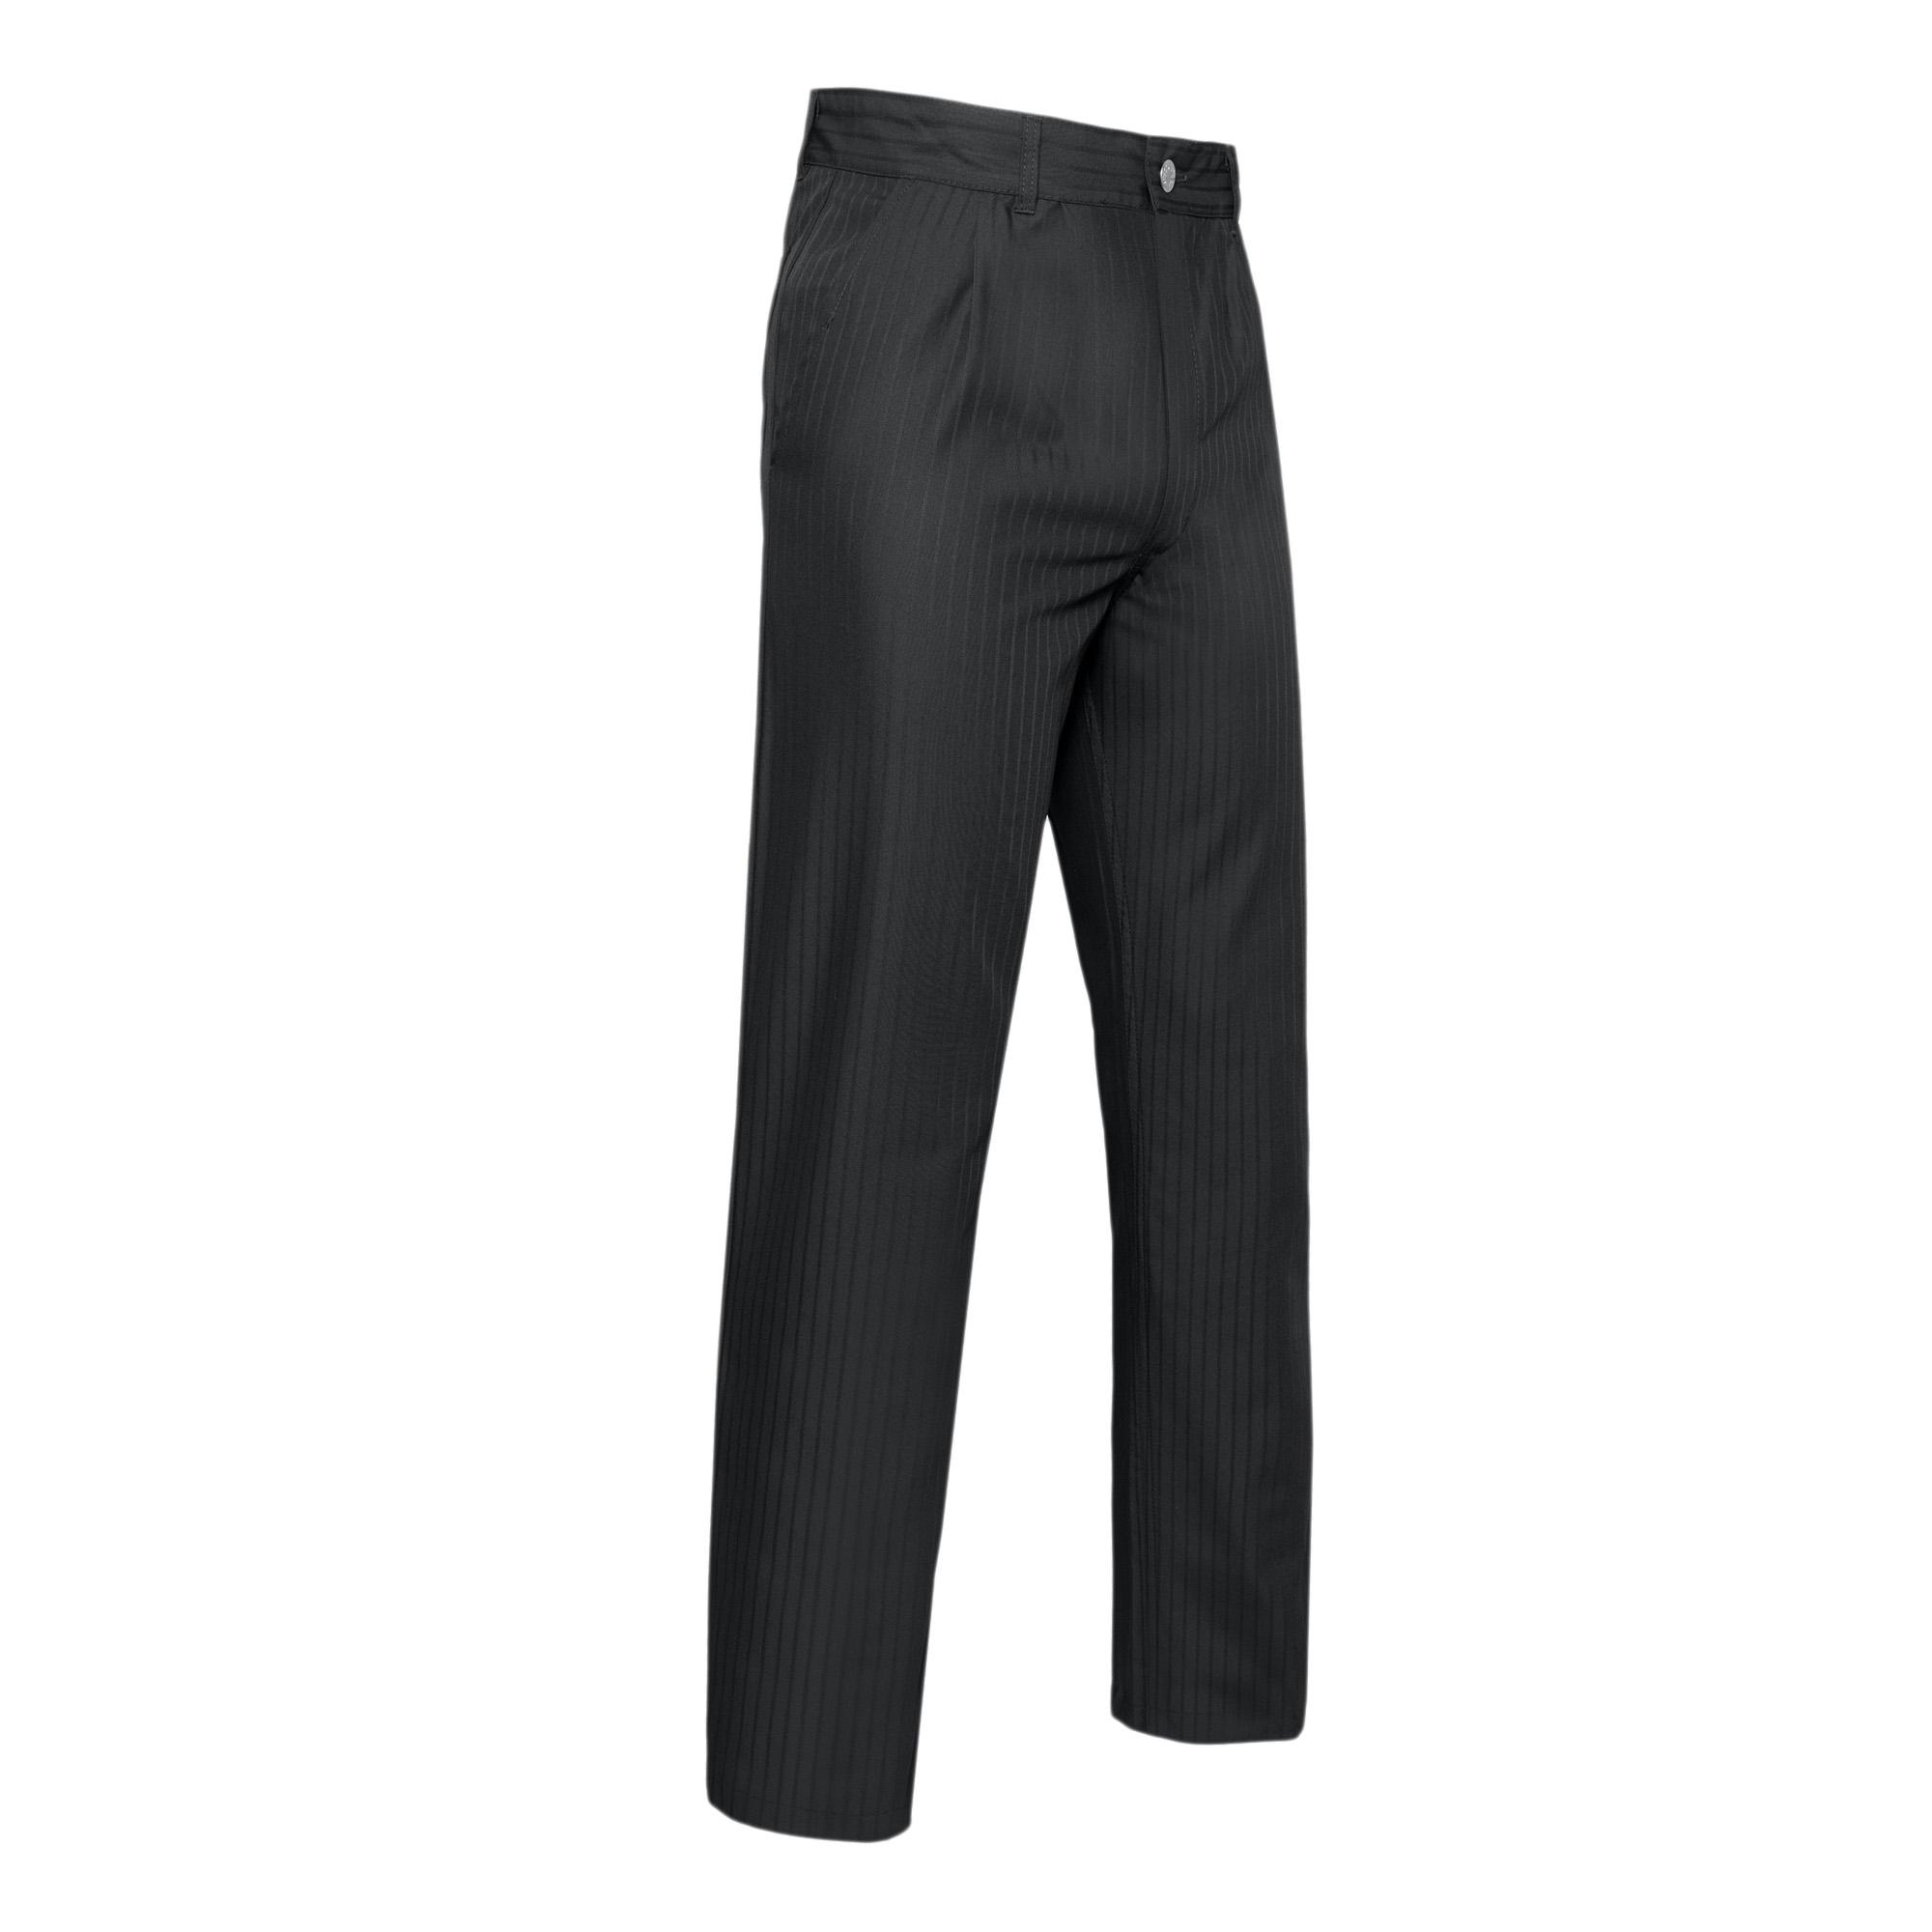 Pantalon Ton sur Ton Black Satin